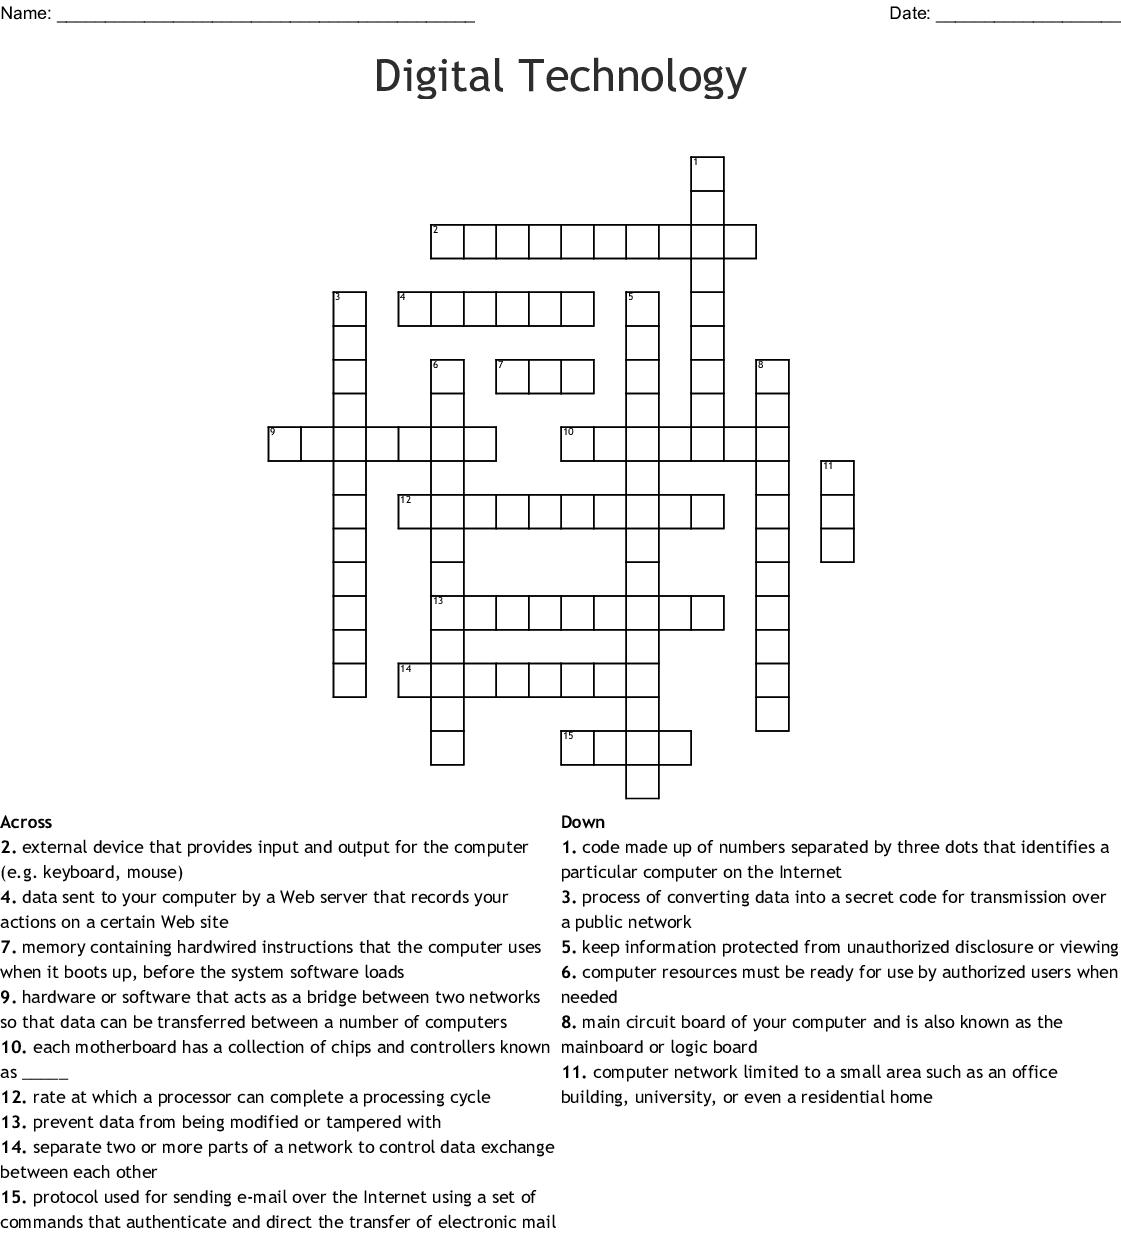 Digital Technology Crossword Wordmint